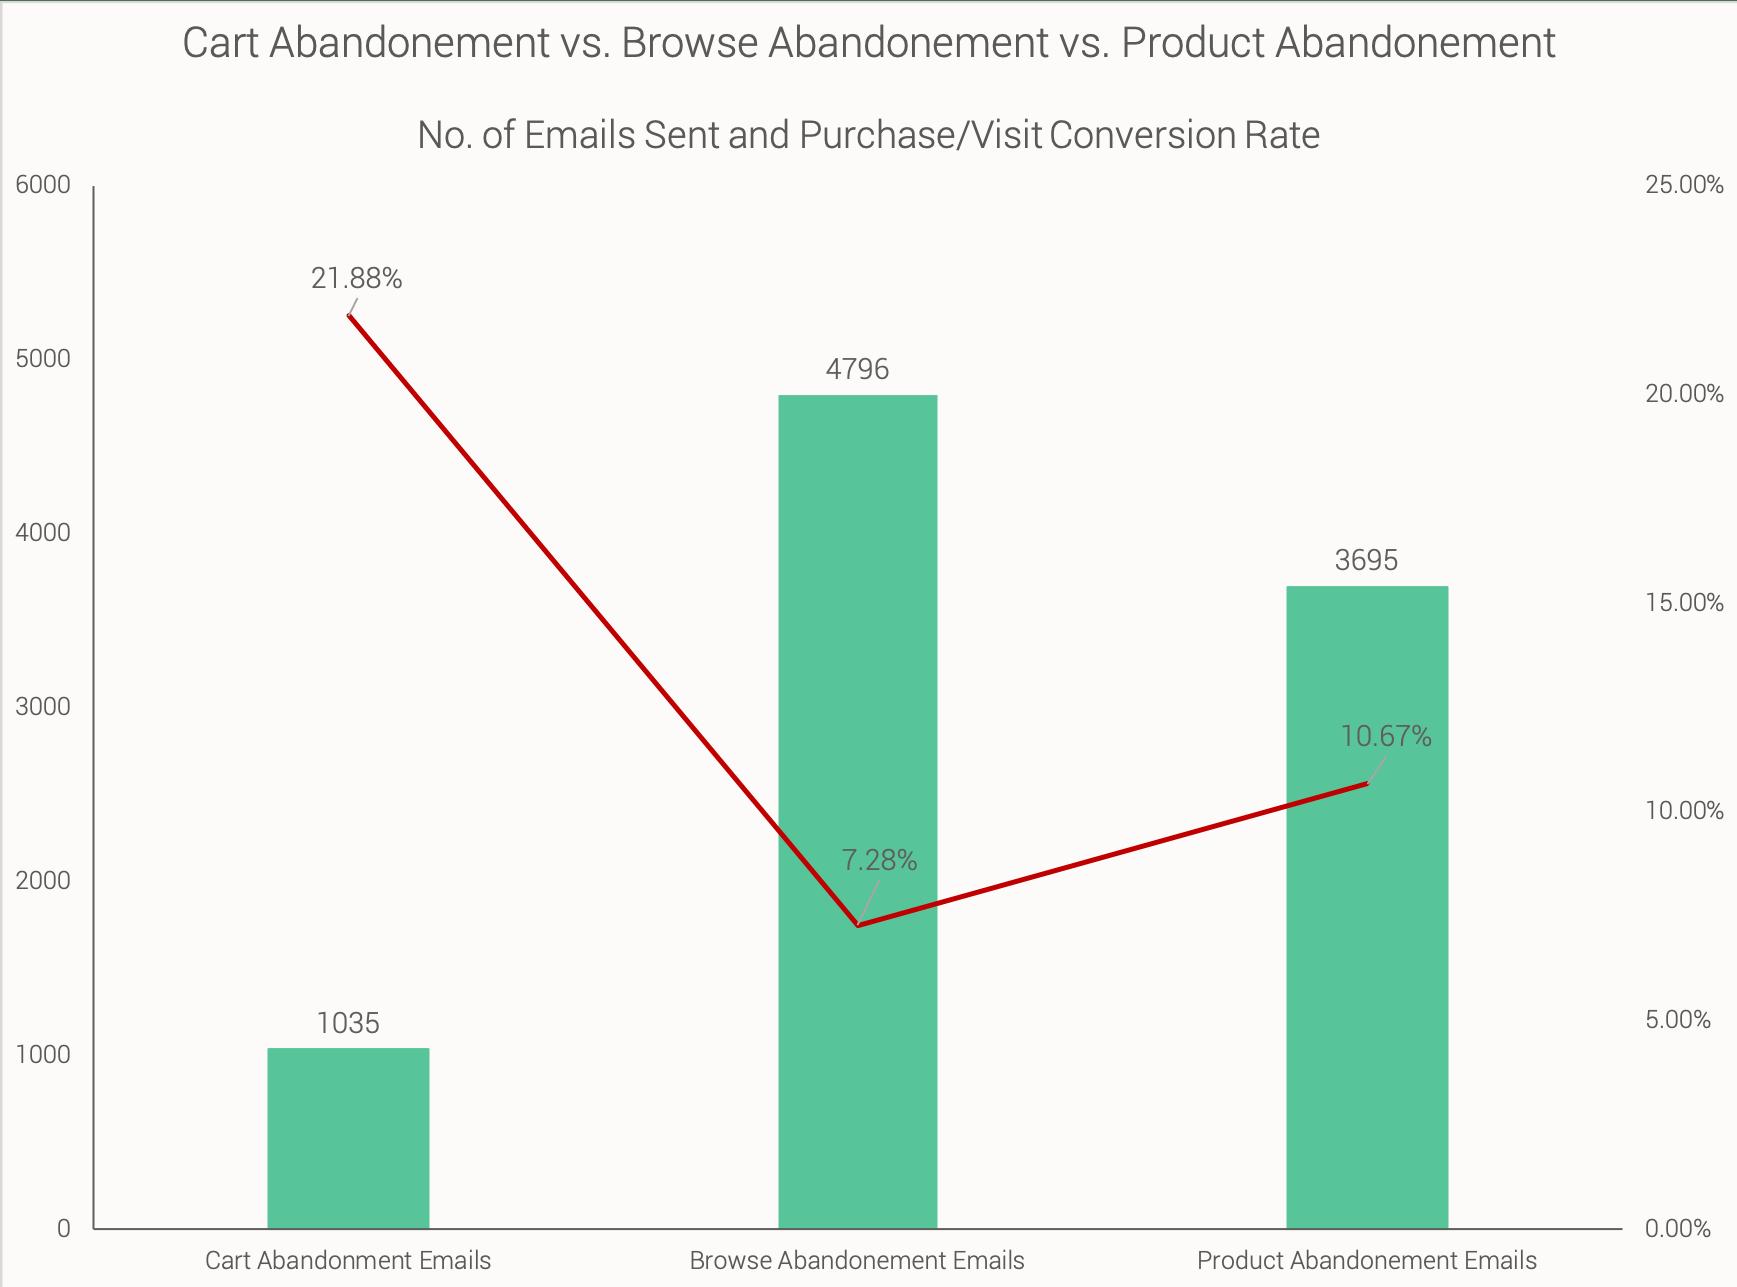 Cart Abandonment vs. Browse Abandonment vs. Product Abandonment email statistics